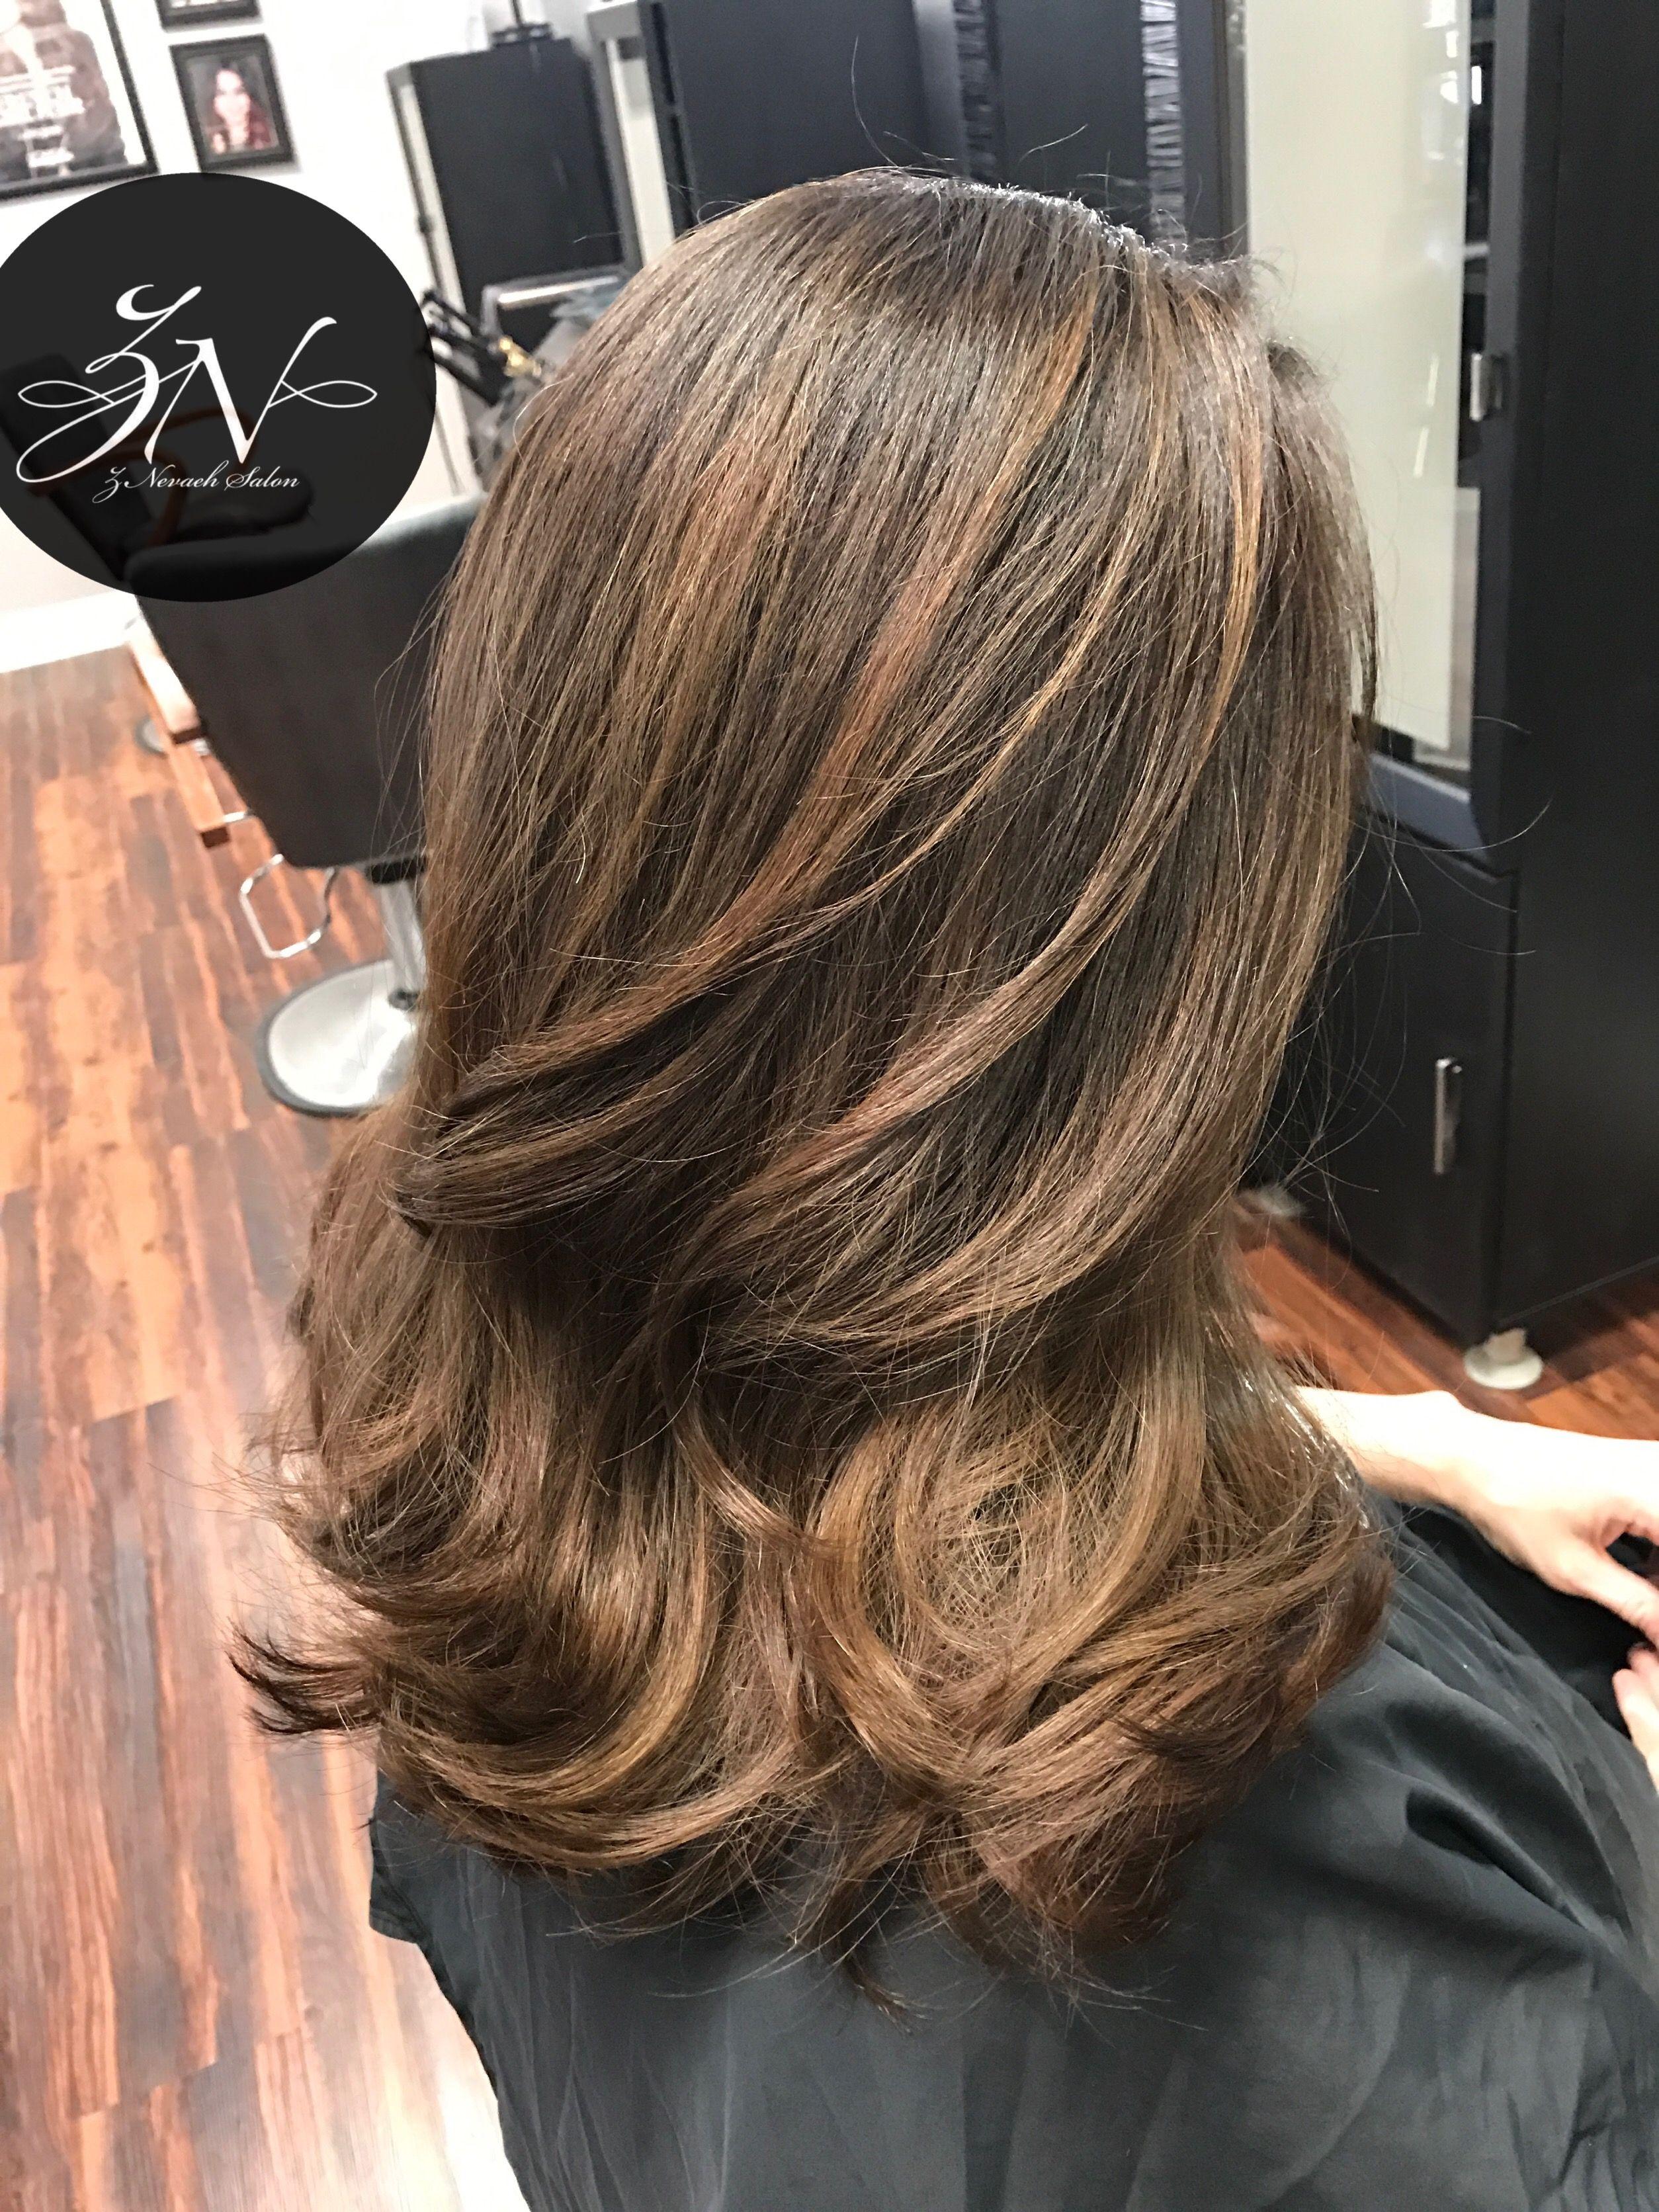 French Brown Color Znevaehsalon Knoxvillesalon Znevaehsalon Brunette Long Hair Styles Gorgeous Hair Brunette Hair